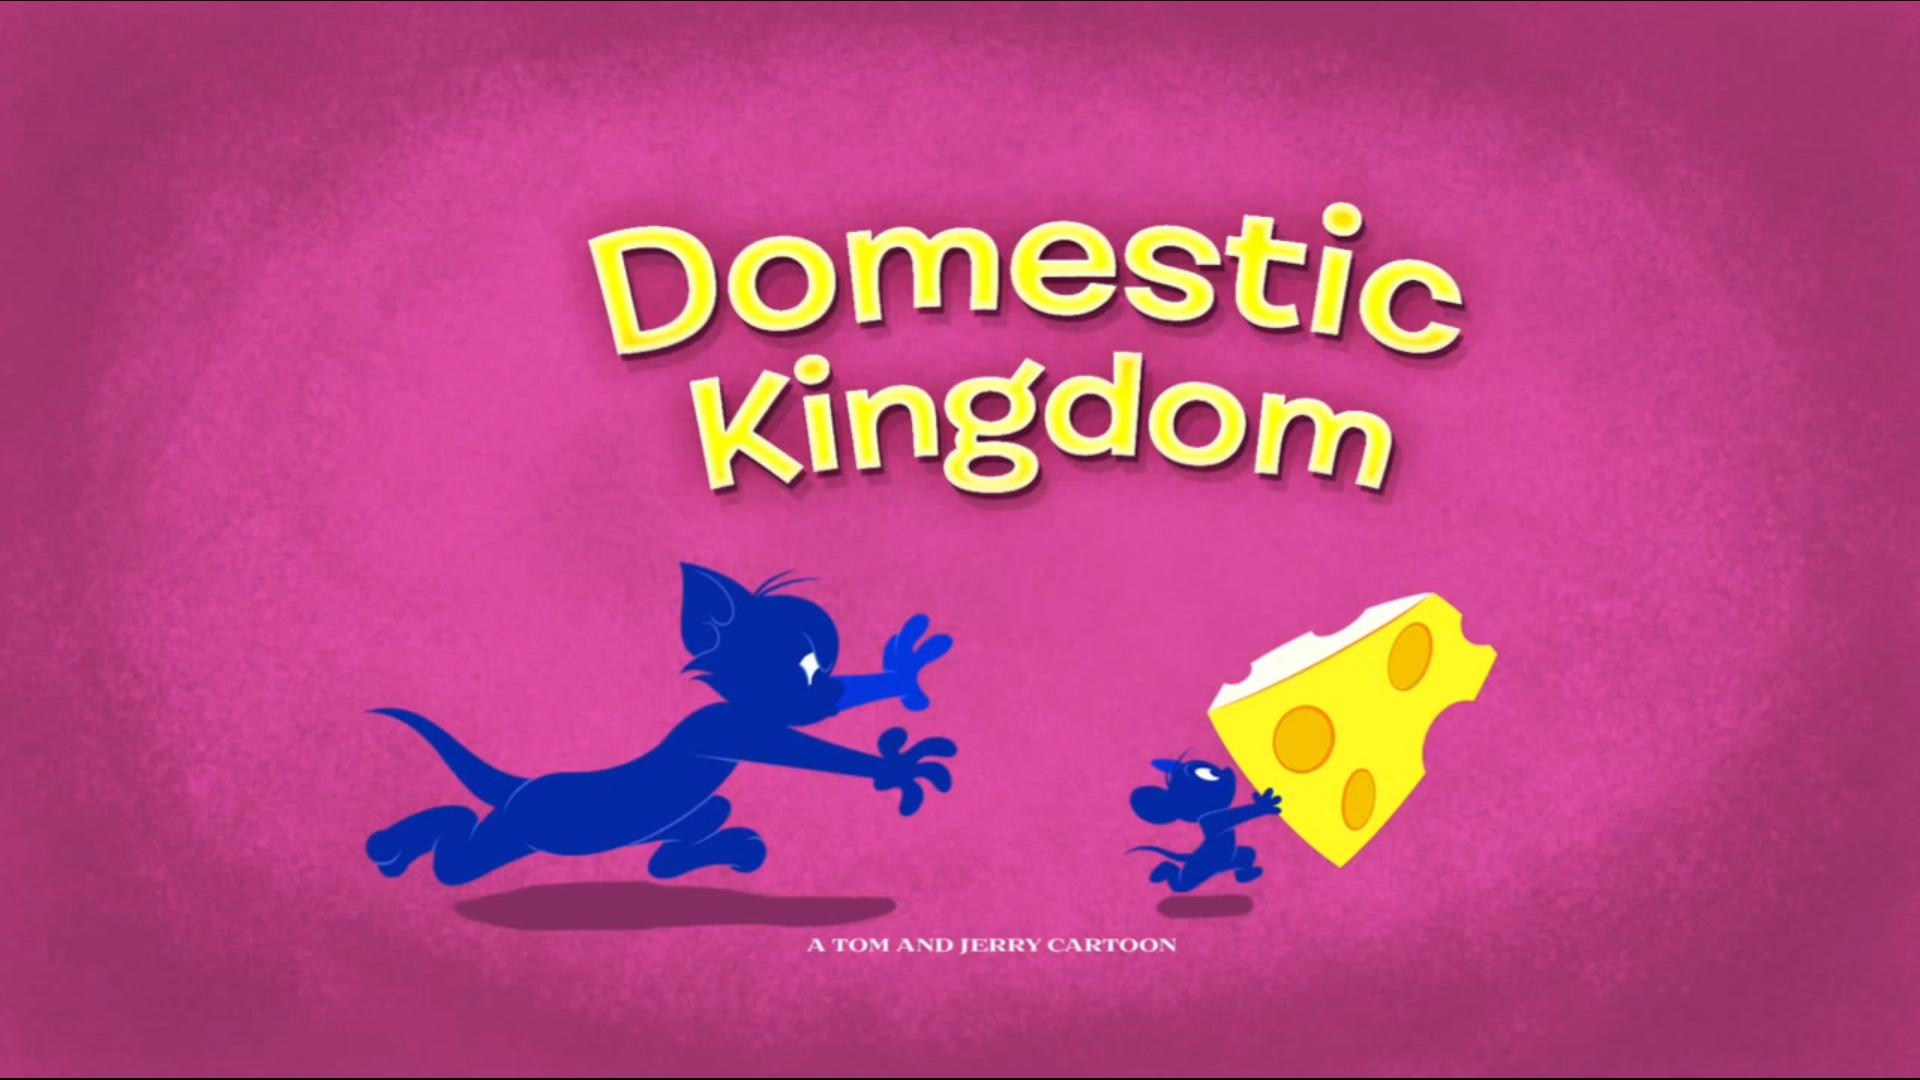 Domestic Kingdom